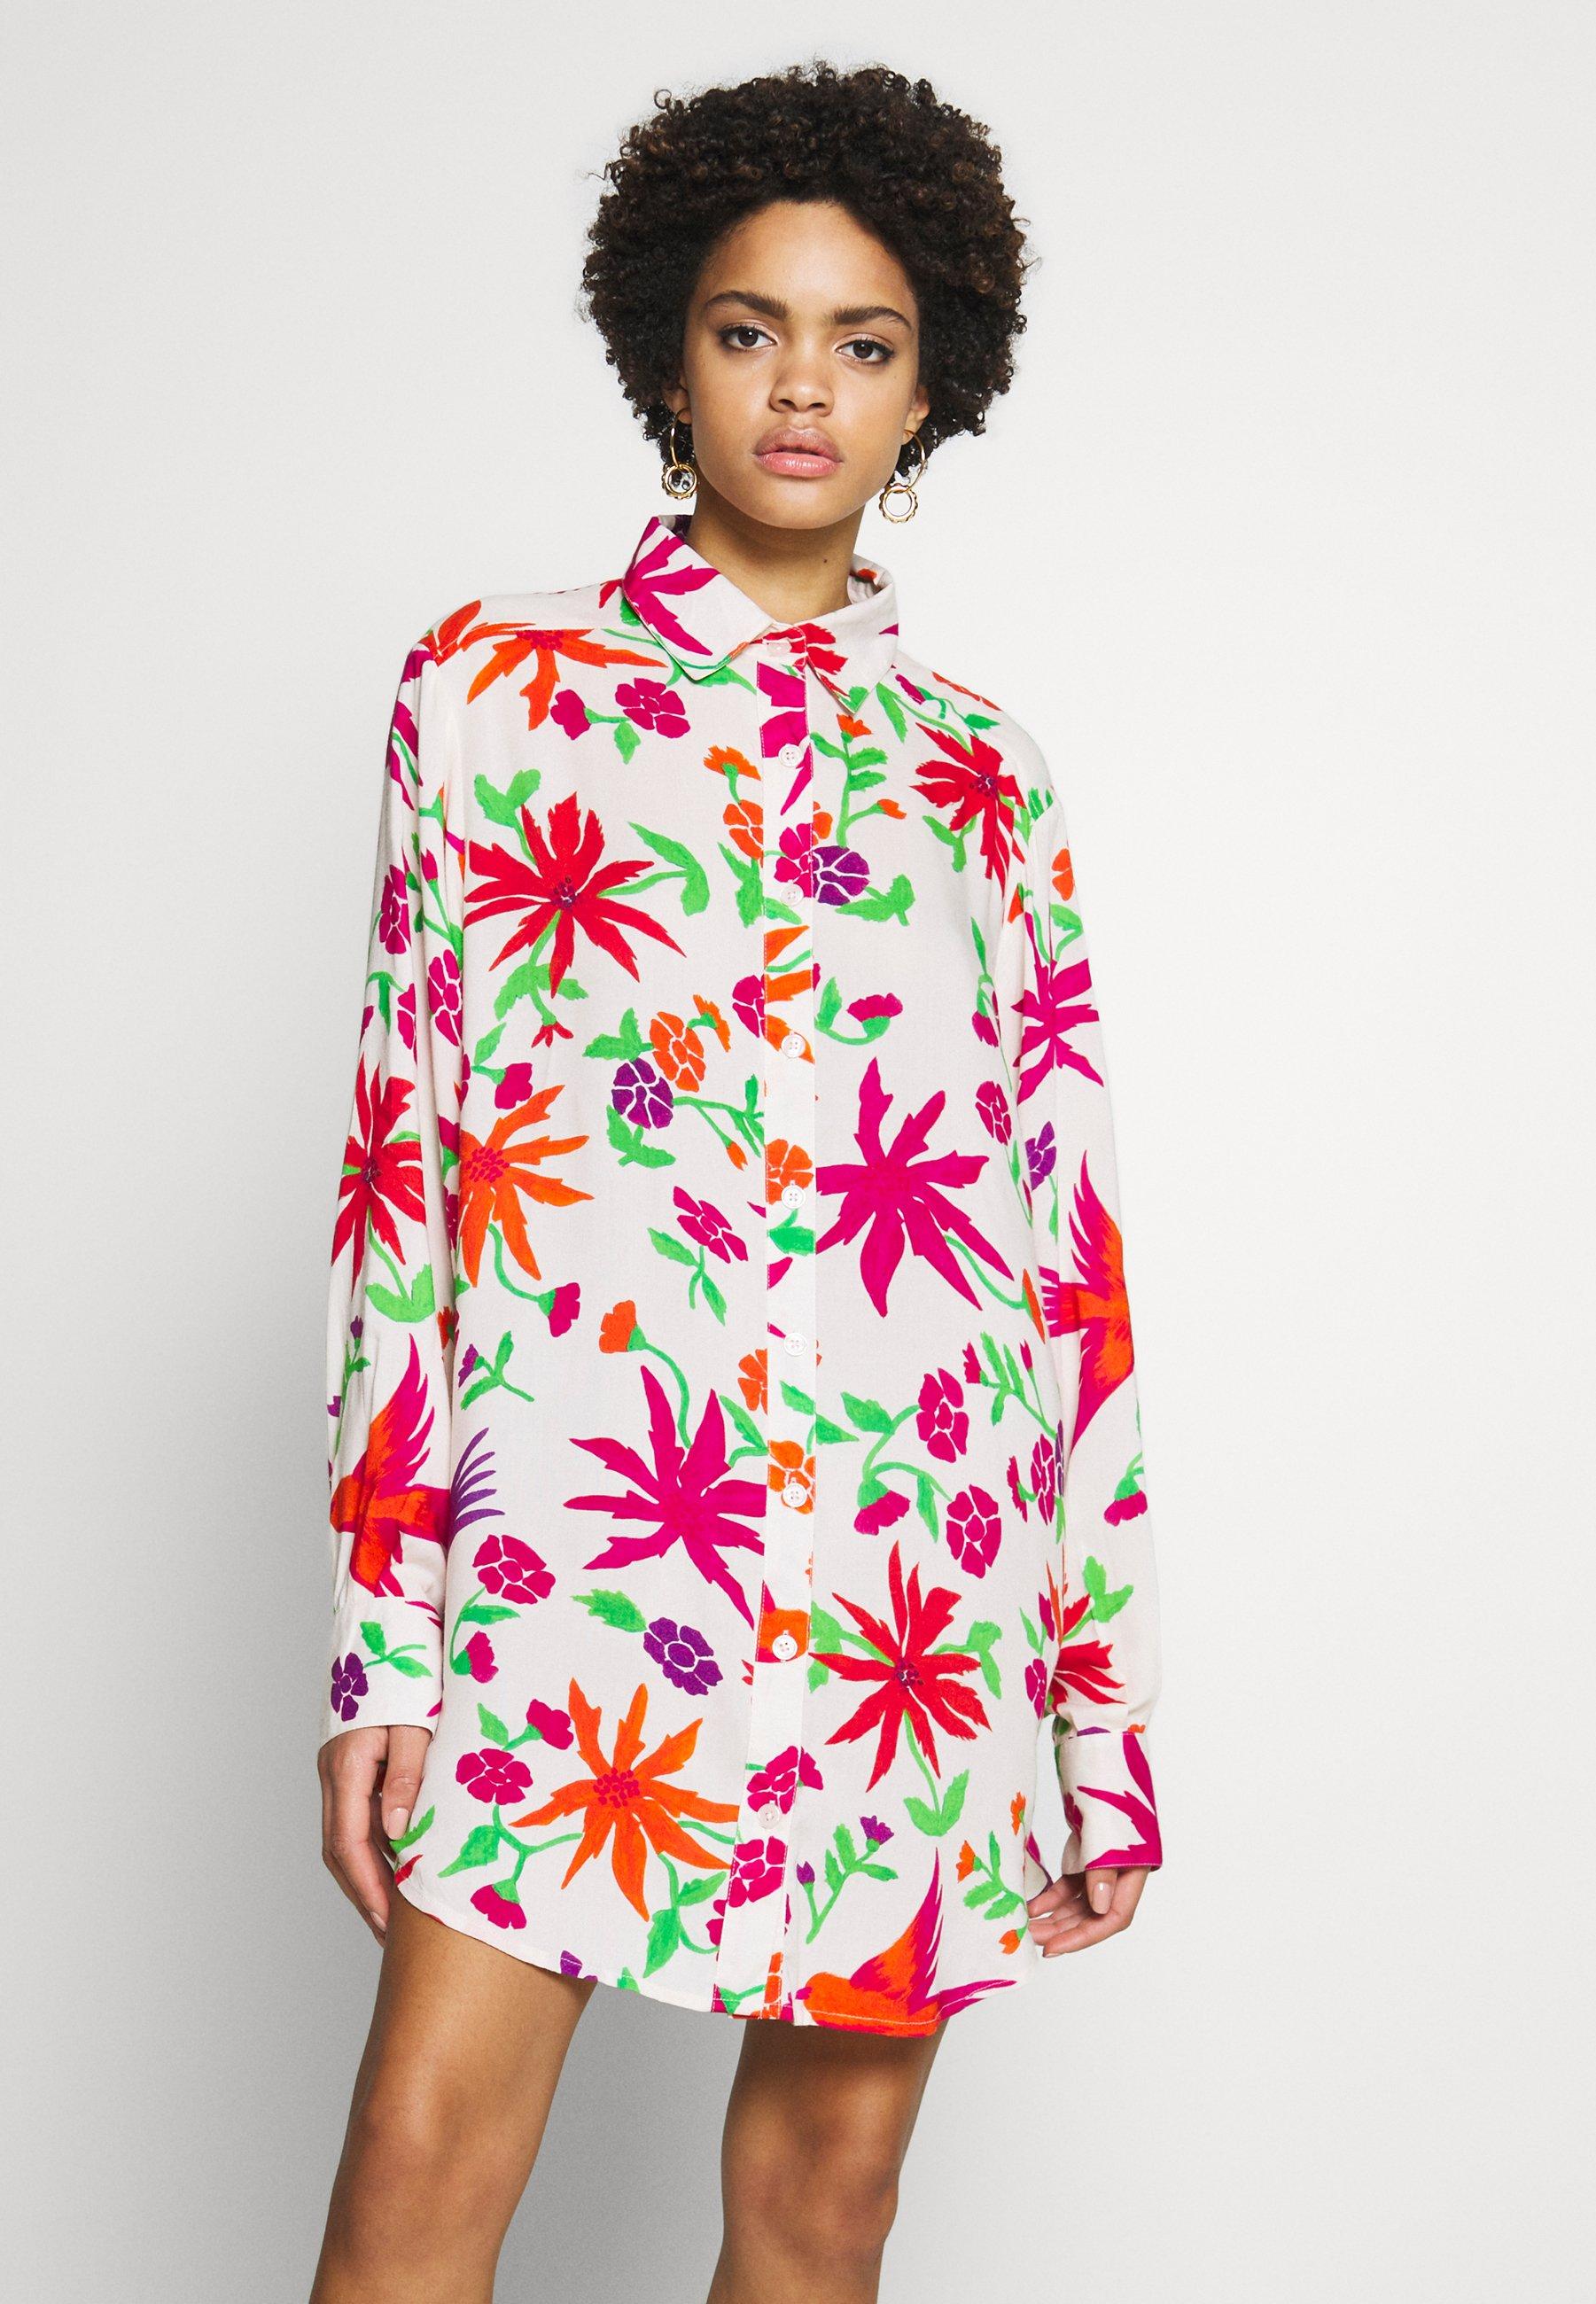 High-Quality Cheap Women's Clothing Stieglitz ADRIANA Button-down blouse pink 5M9RUEfrb